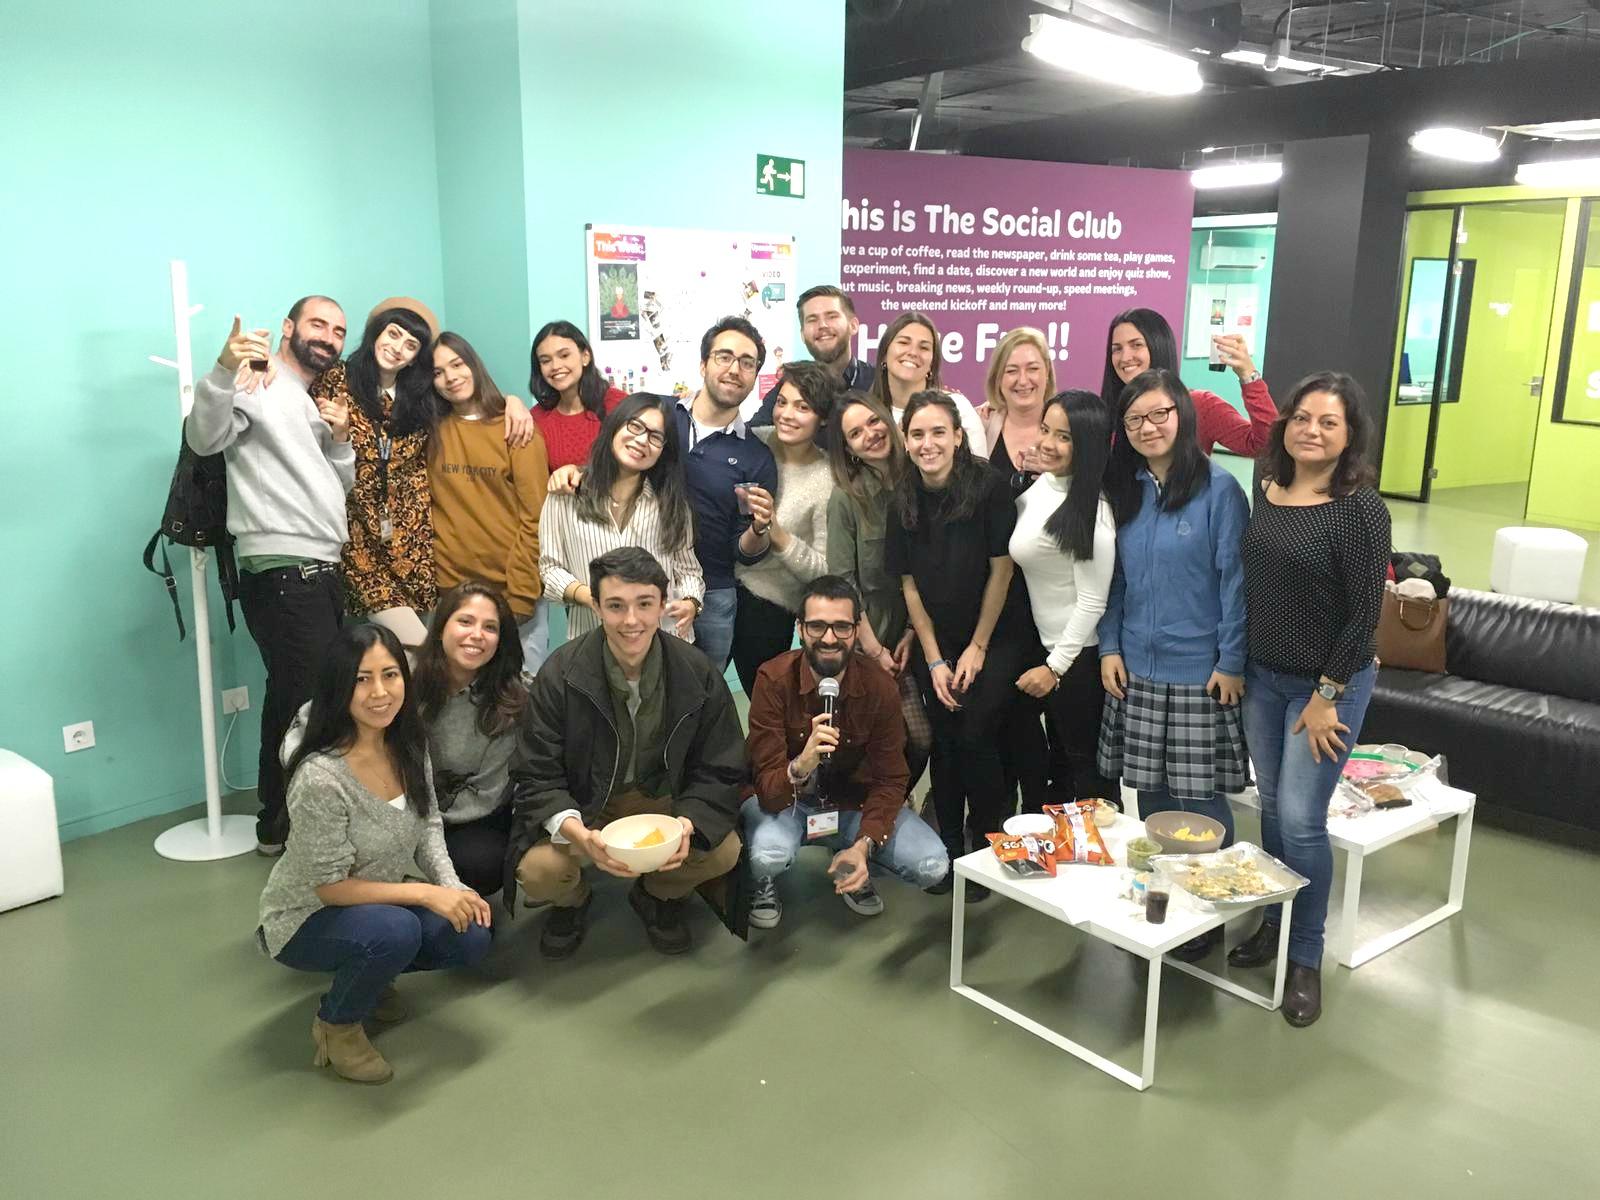 Fiesta de Thanksgiving en la academia de inglés What's Up!